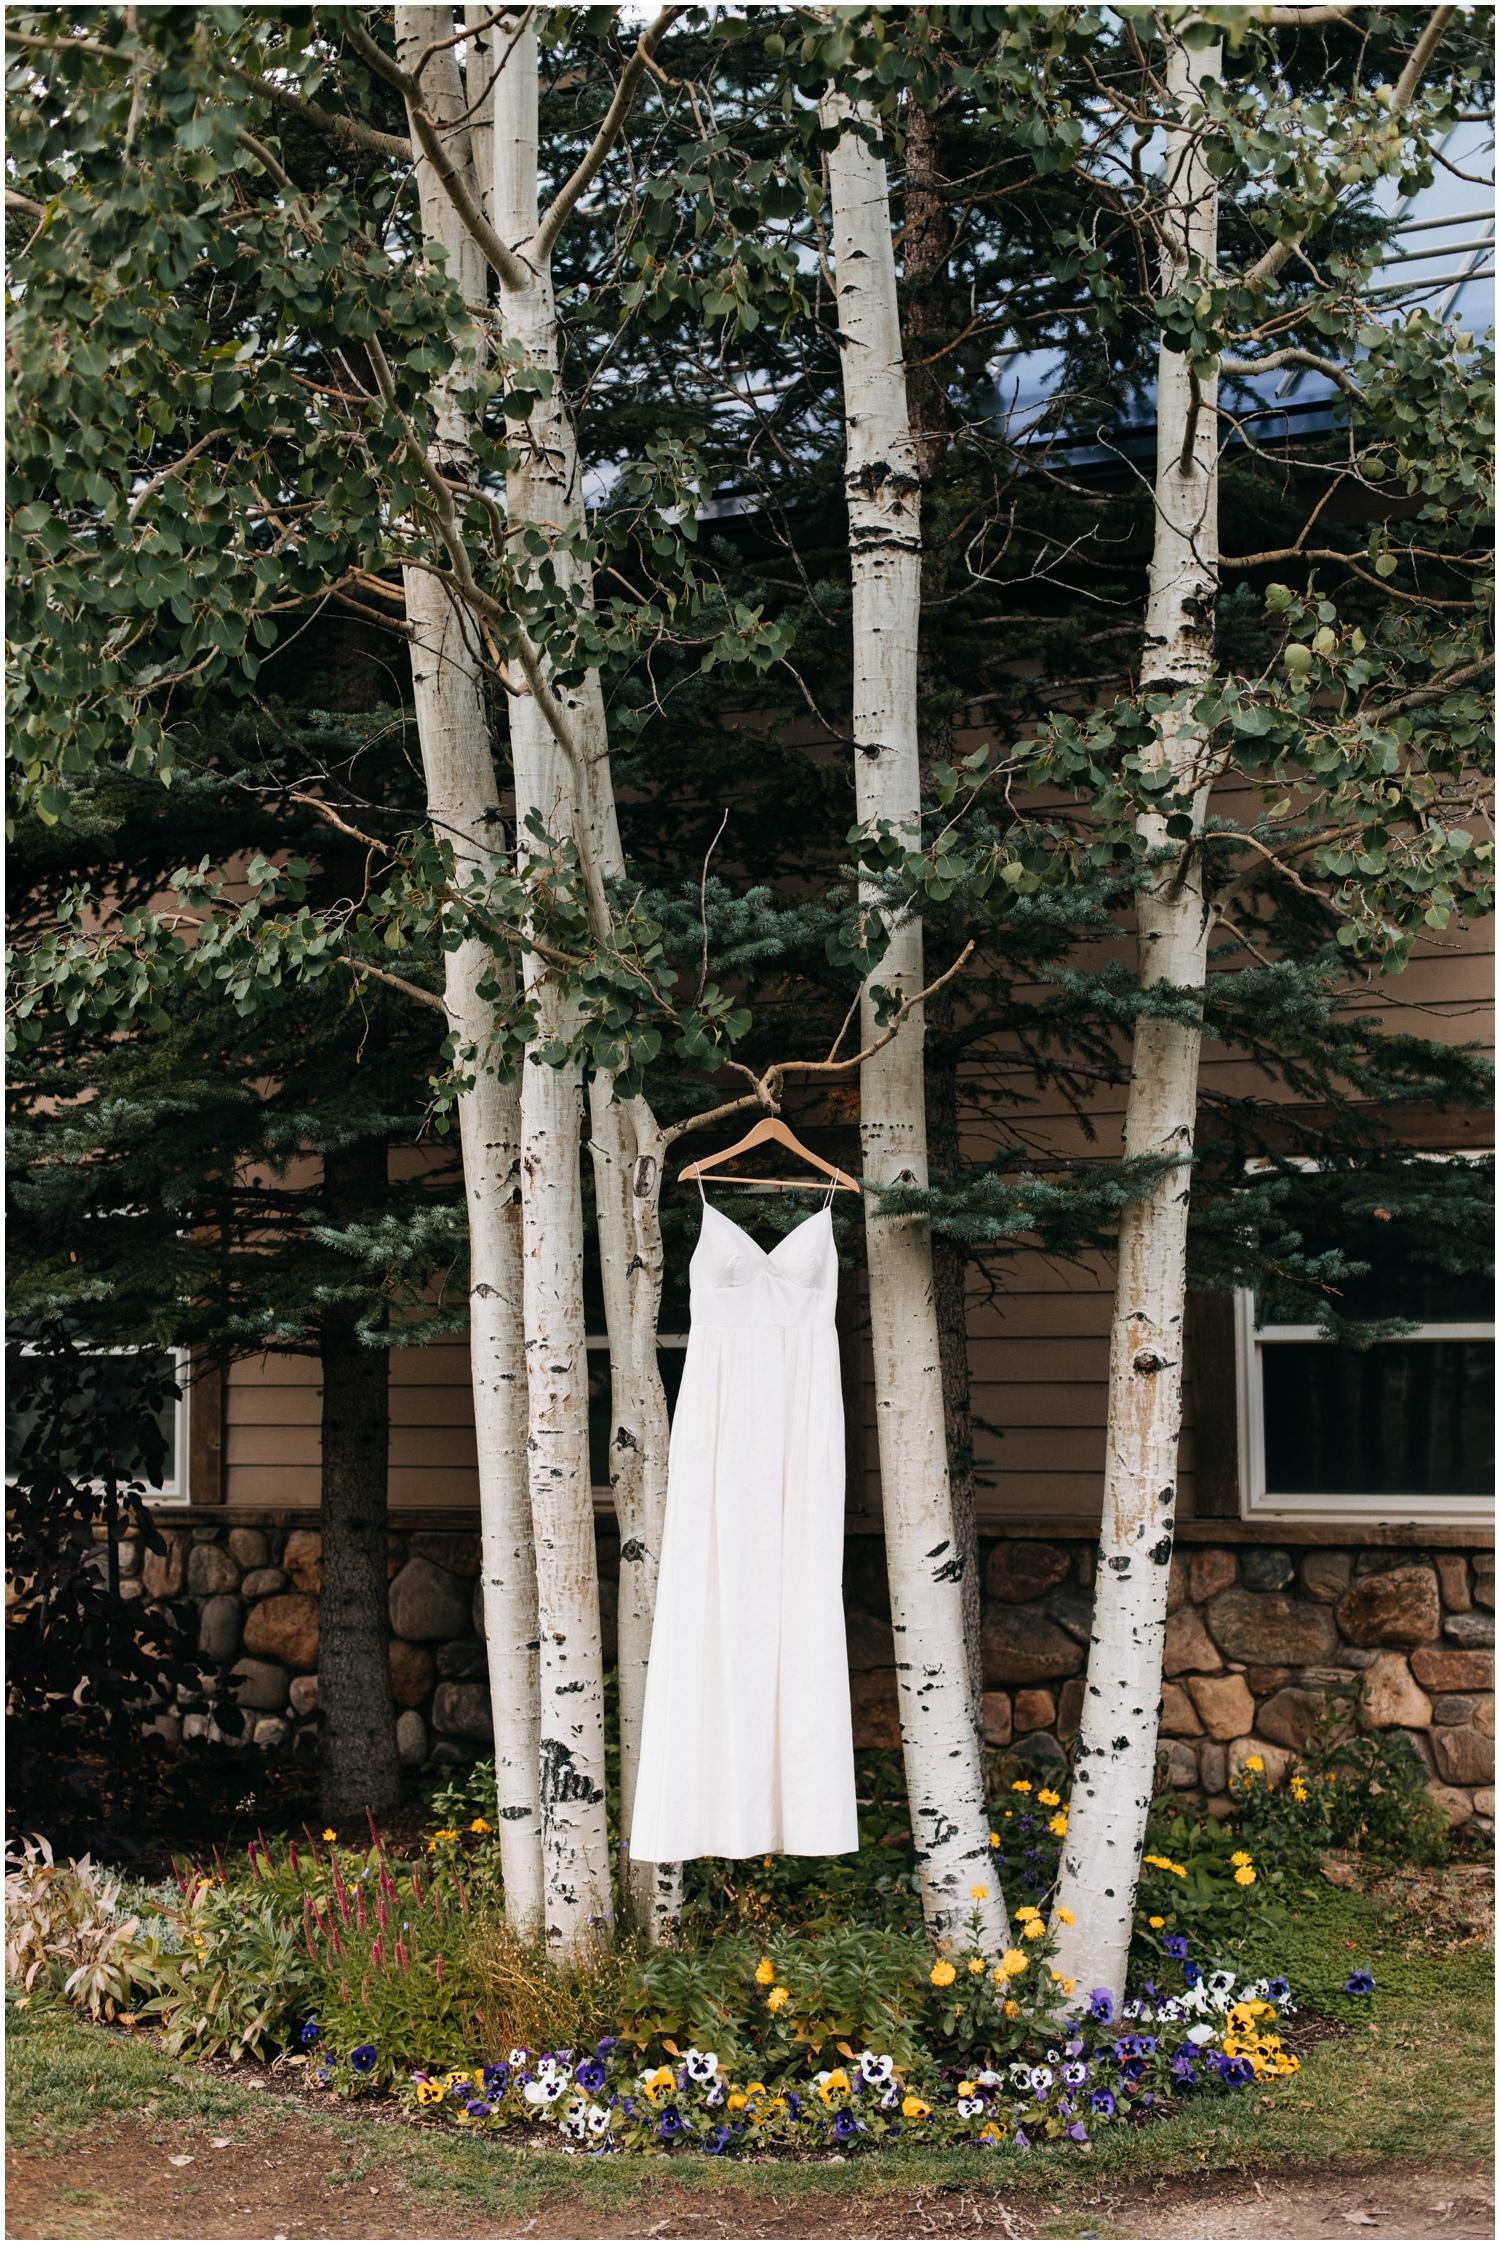 NadegeandJoe_elegant_winter_park_wedding_lodge_at_sunspot_mountain_taylor_powers_0379.jpg